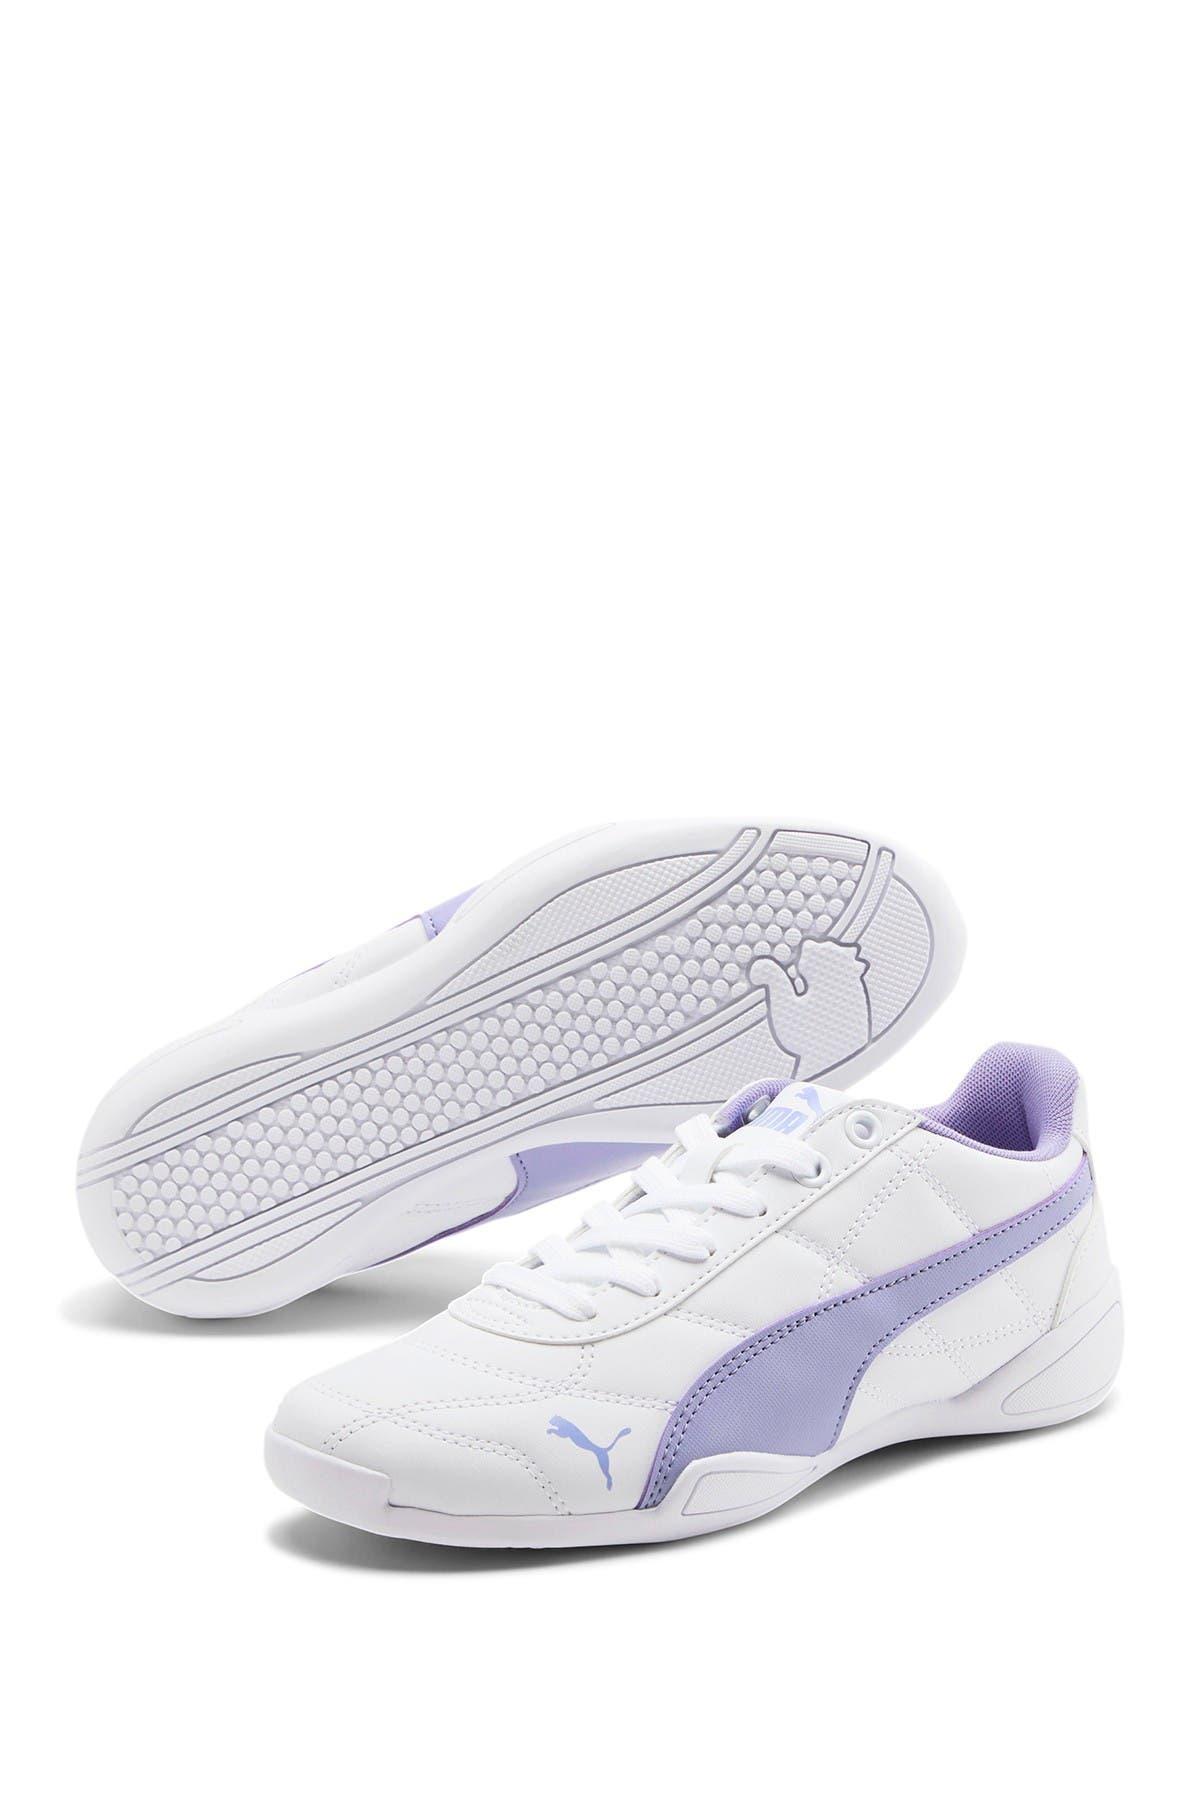 Image of PUMA Tune Cat 3 Sneaker